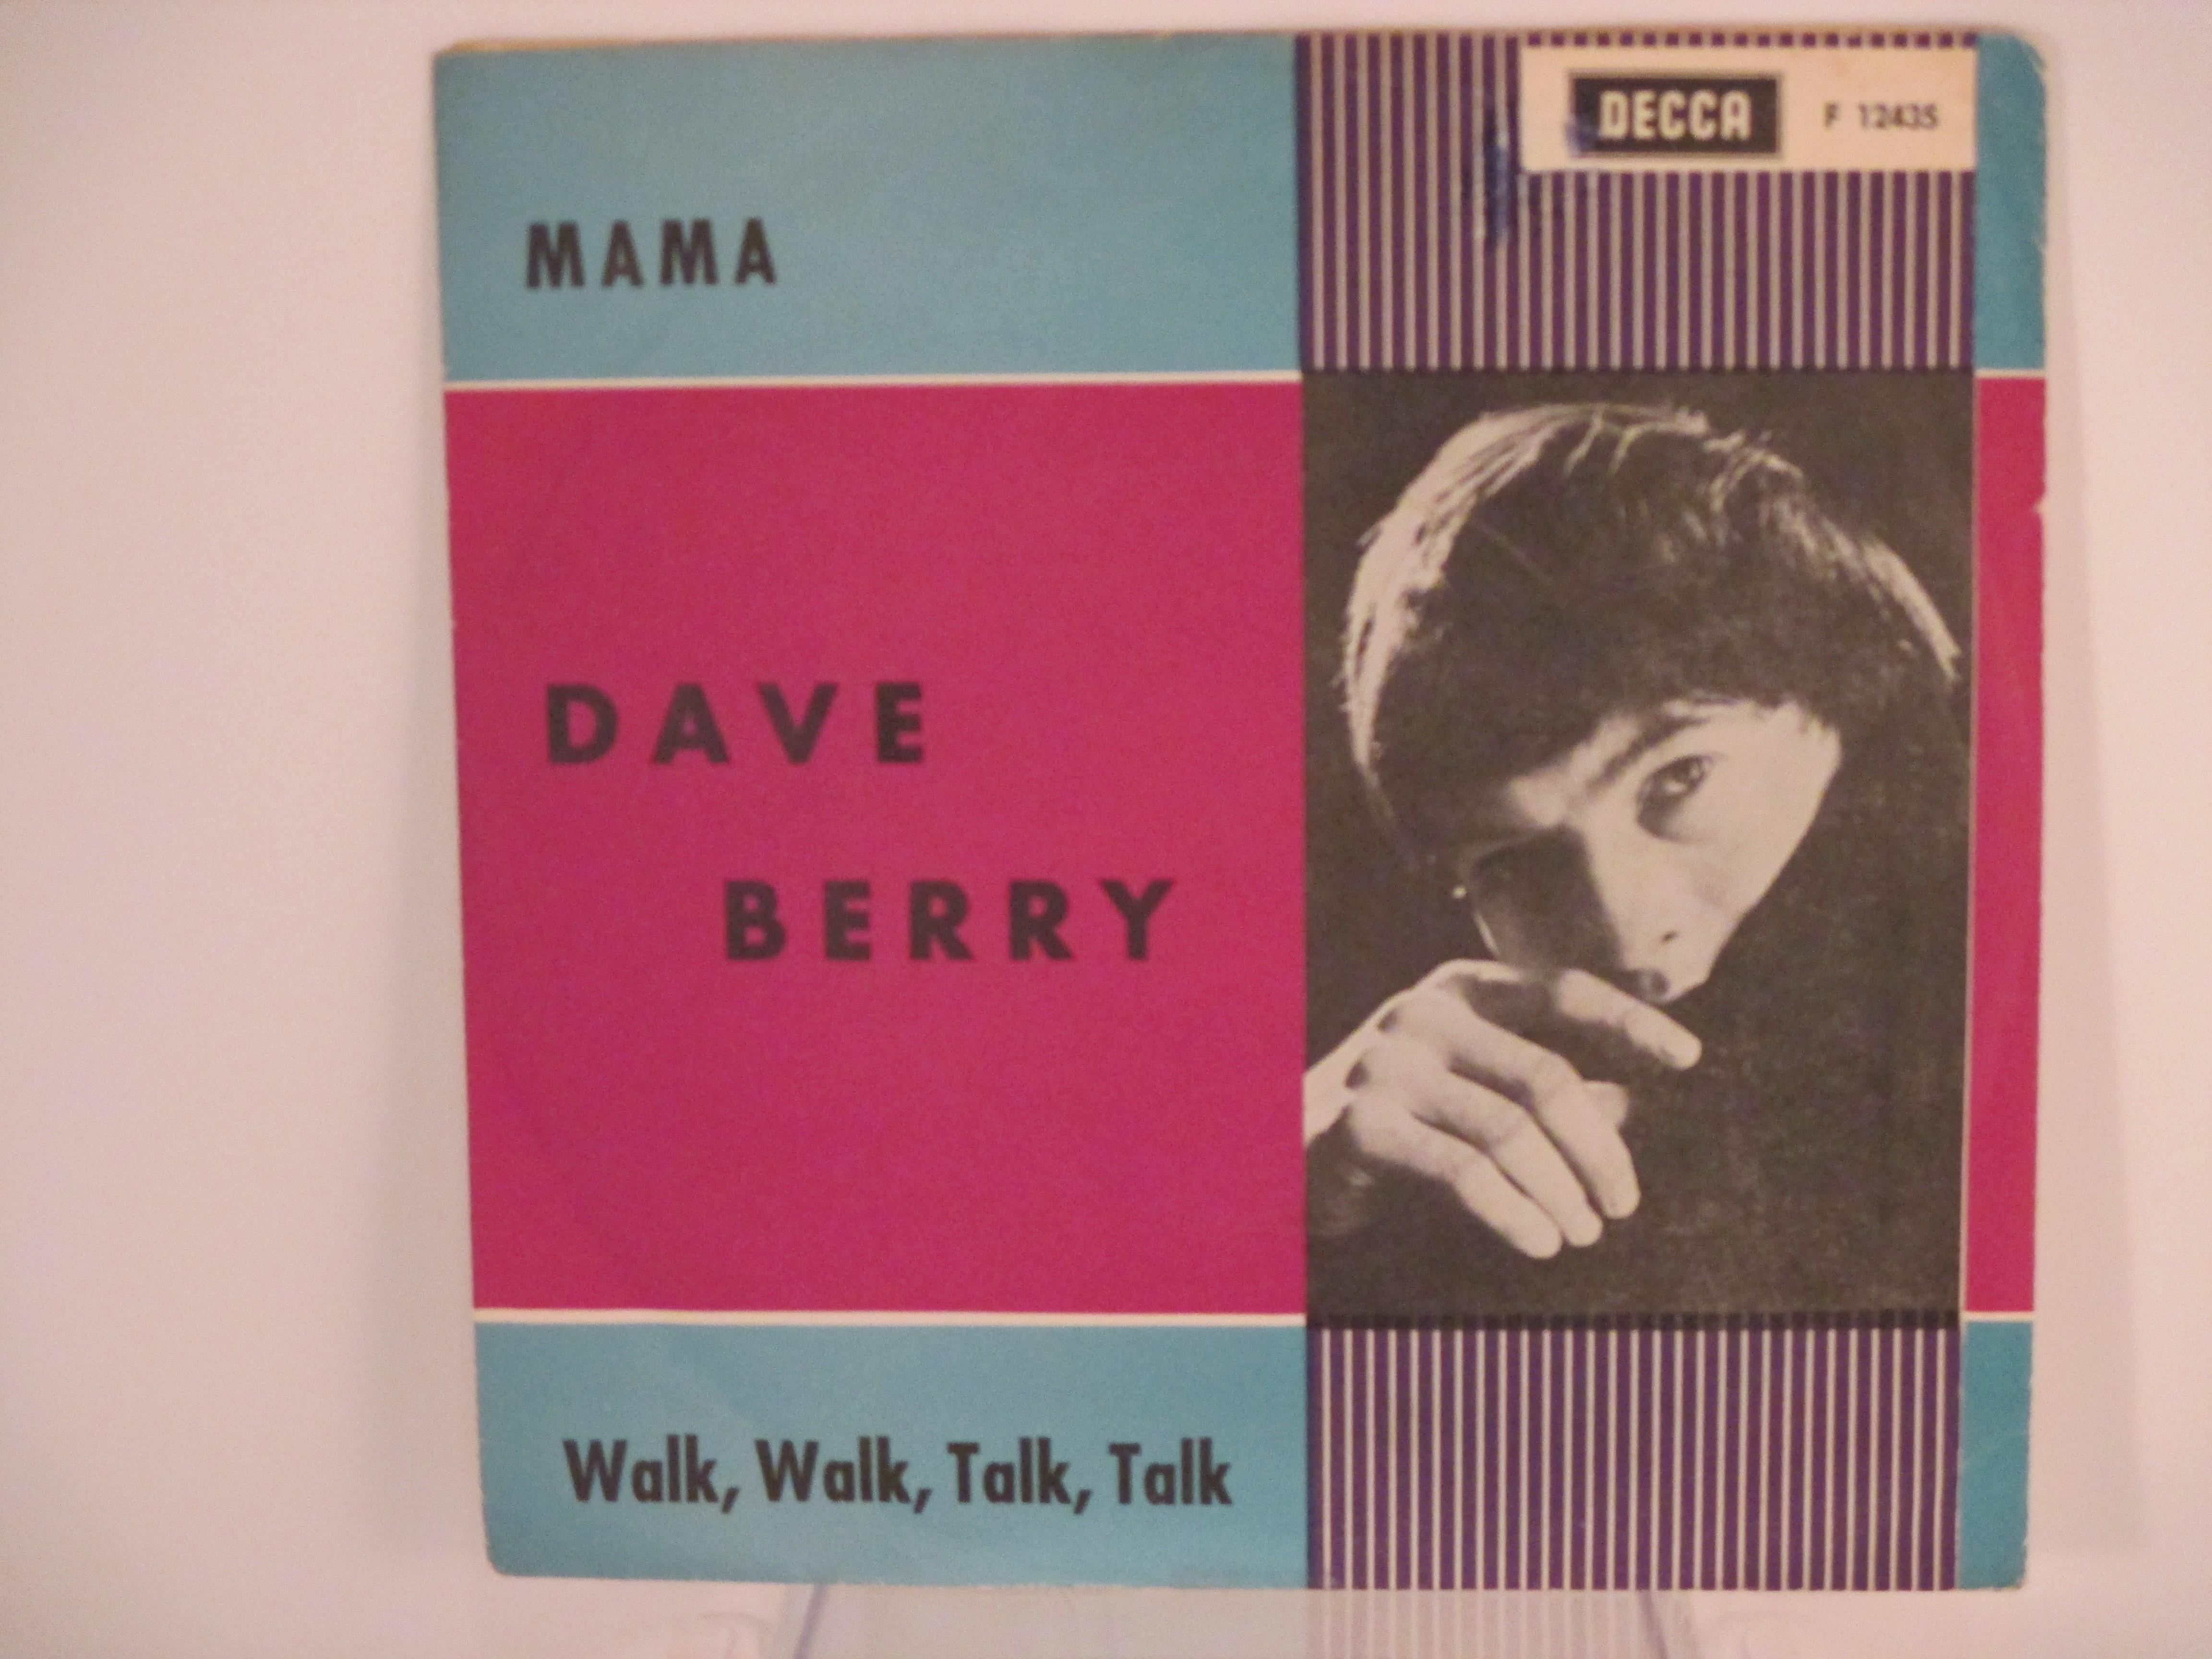 DAVE BERRY : Mama / Walk, walk, talk, talk